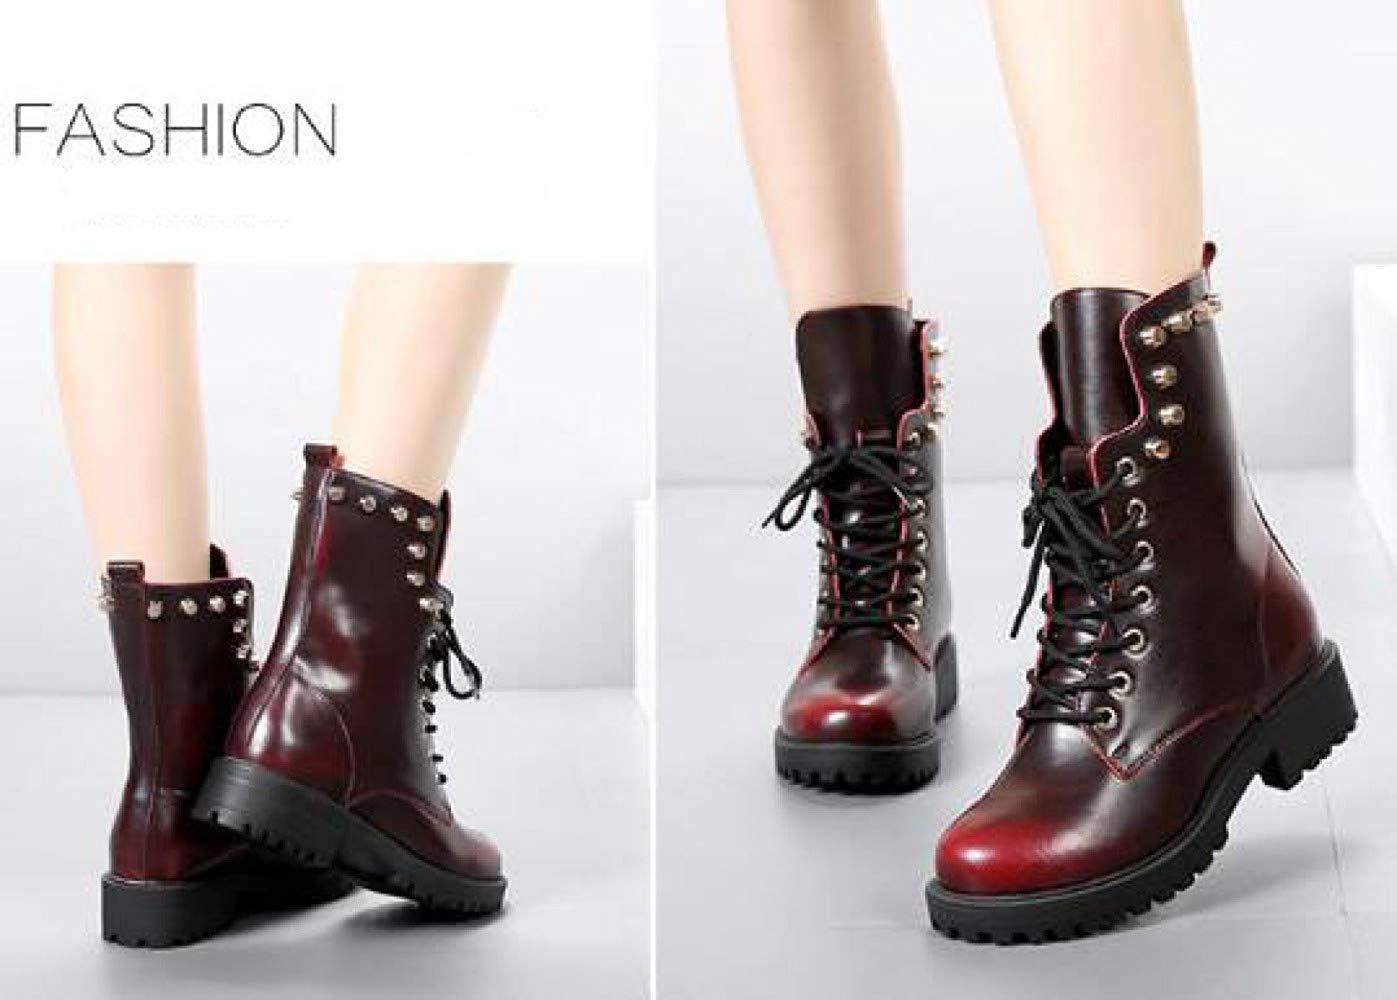 Qiusa Qiusa Qiusa Herbst Und Winter Leder Mode Martin Stiefel Warme Schuhe (Farbe   4 Größe   42EU) 43676c